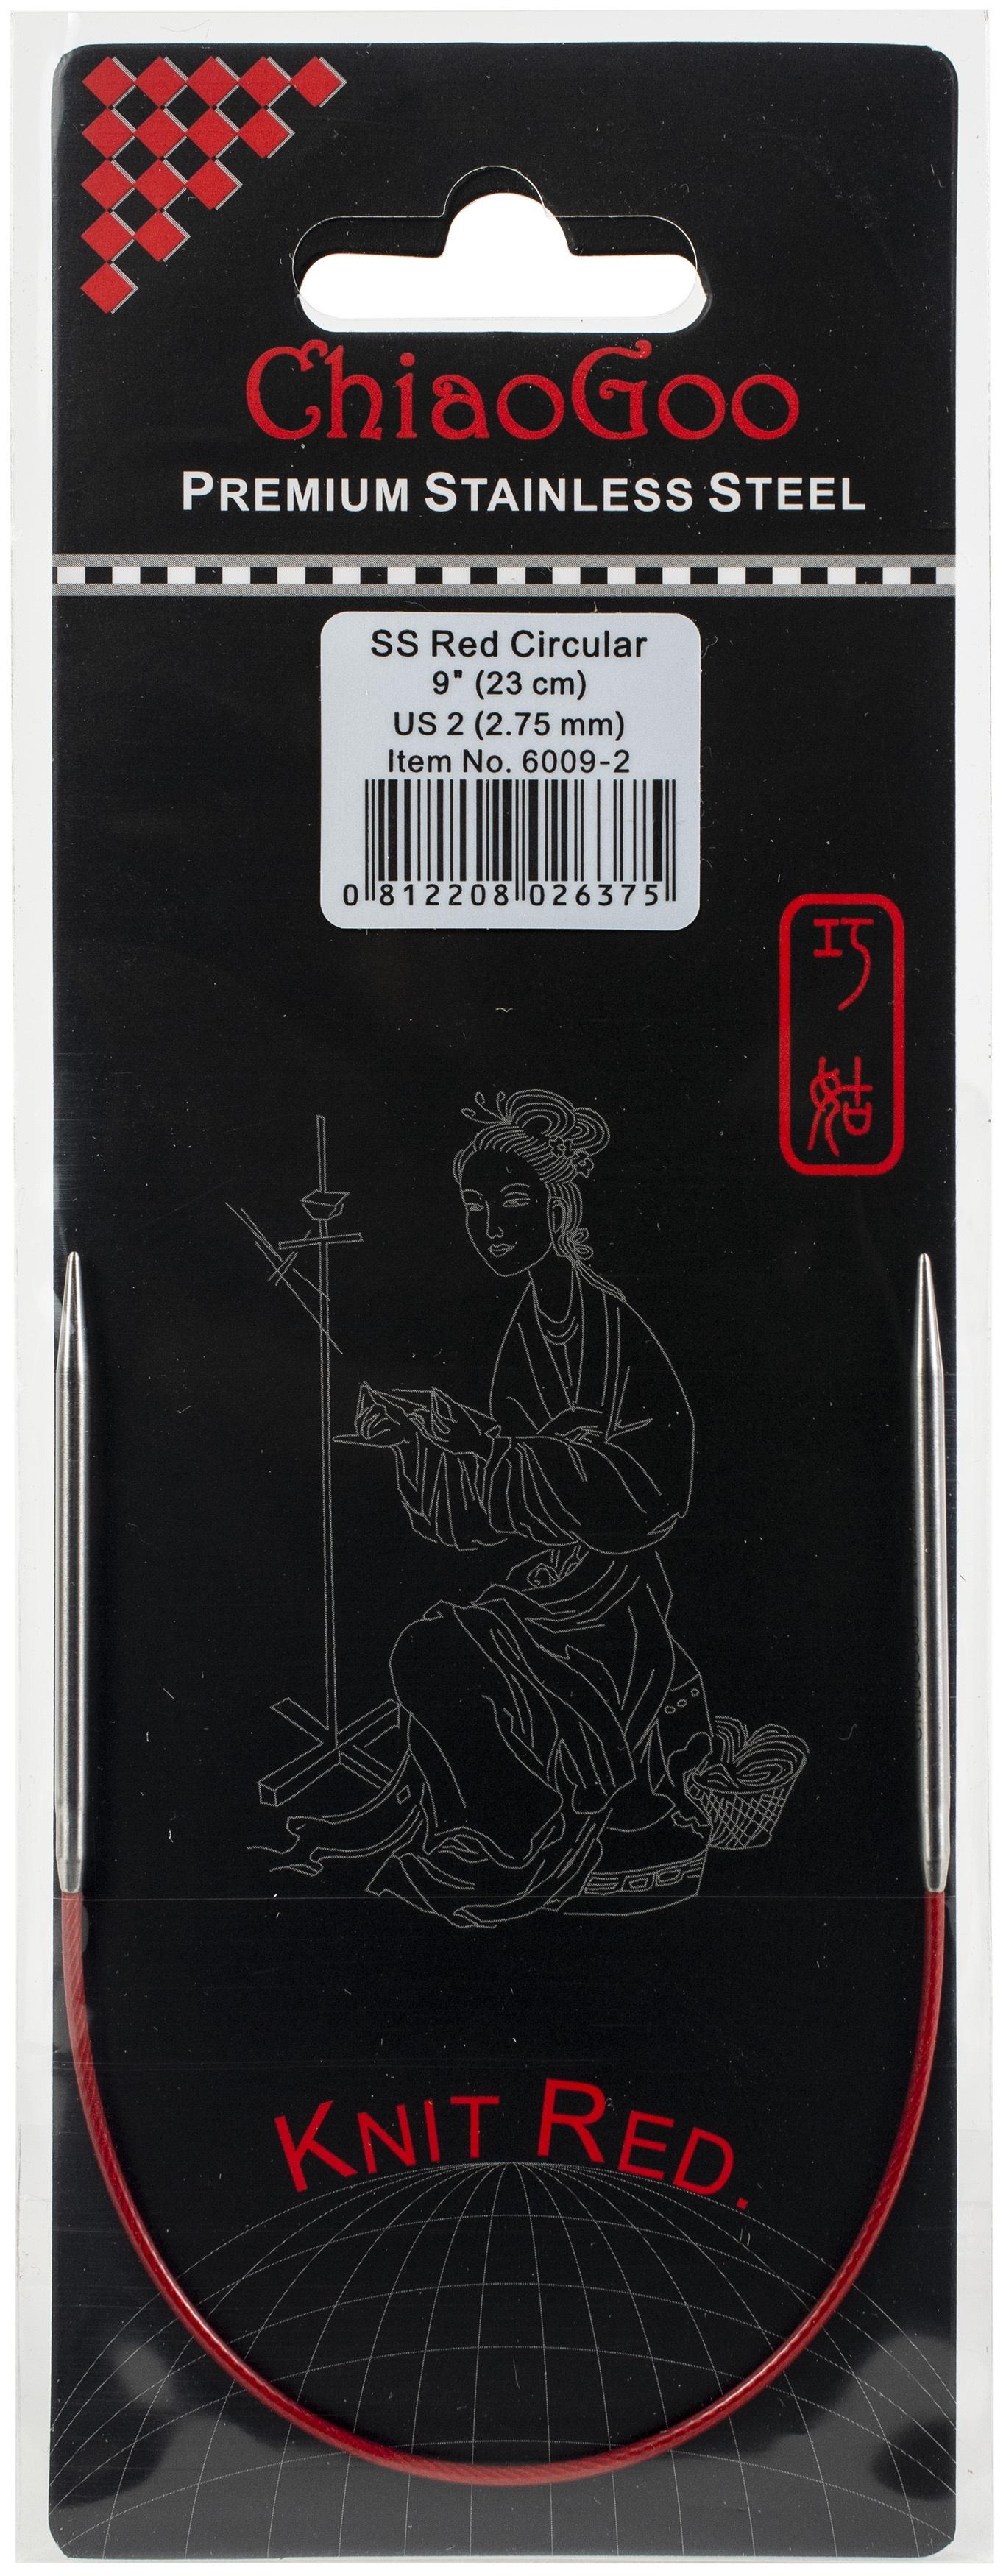 ChiaoGoo Red Circular Knitting Needles 9